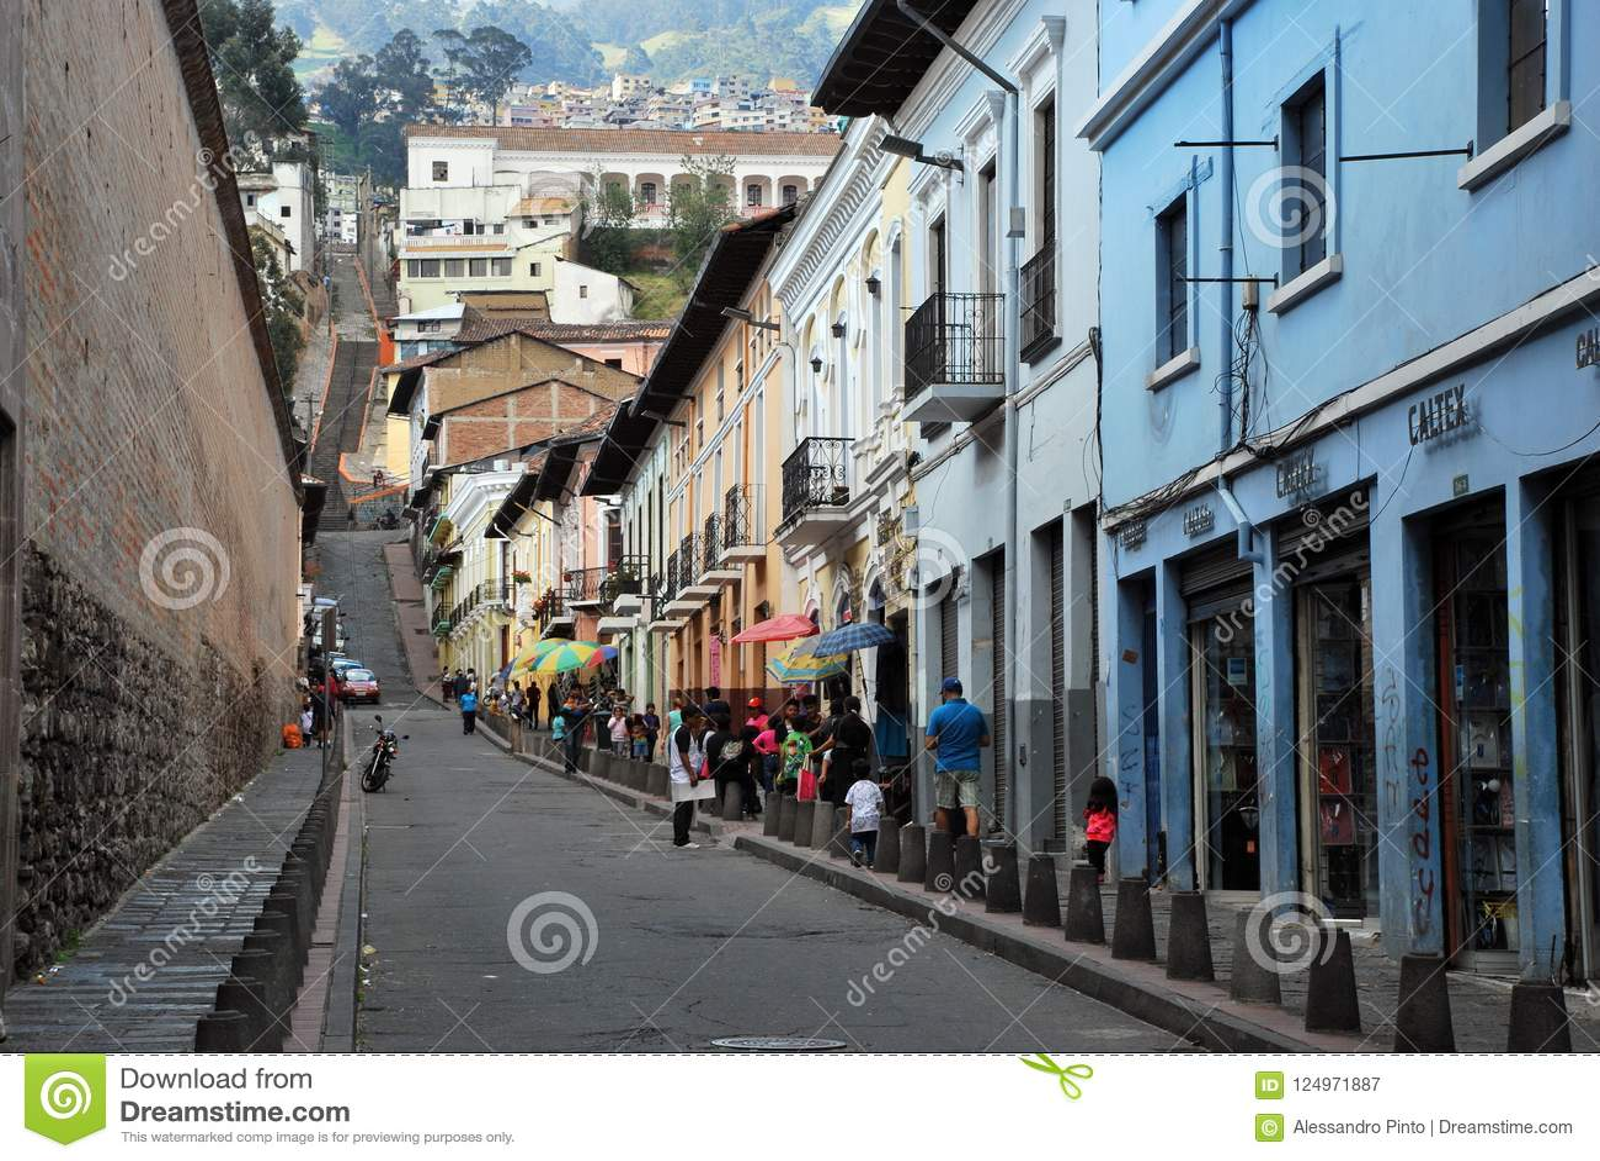 Colonial Architecture In Quito Ecuador Editorial Photography